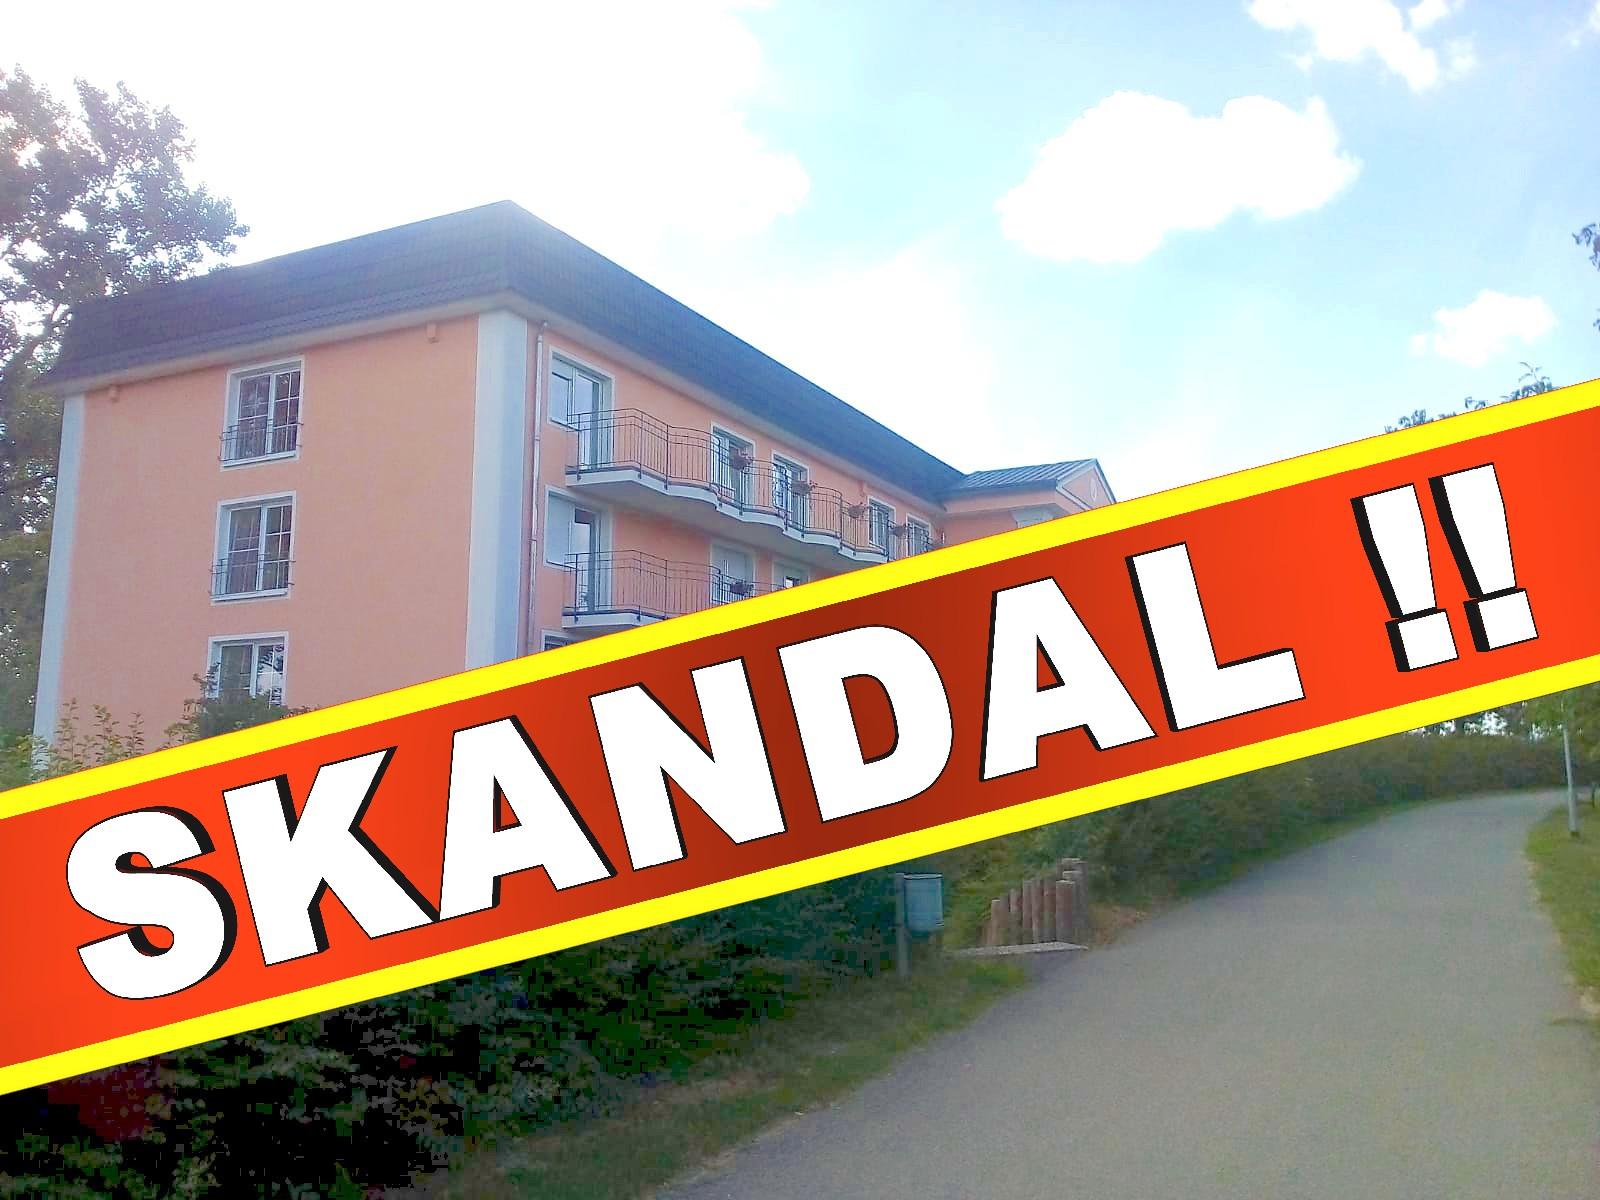 Bezirksklinikum Obermain Kutzenberg, 96250 Ebensfeld Psychiatrie Polizei Krankenhaus (26)